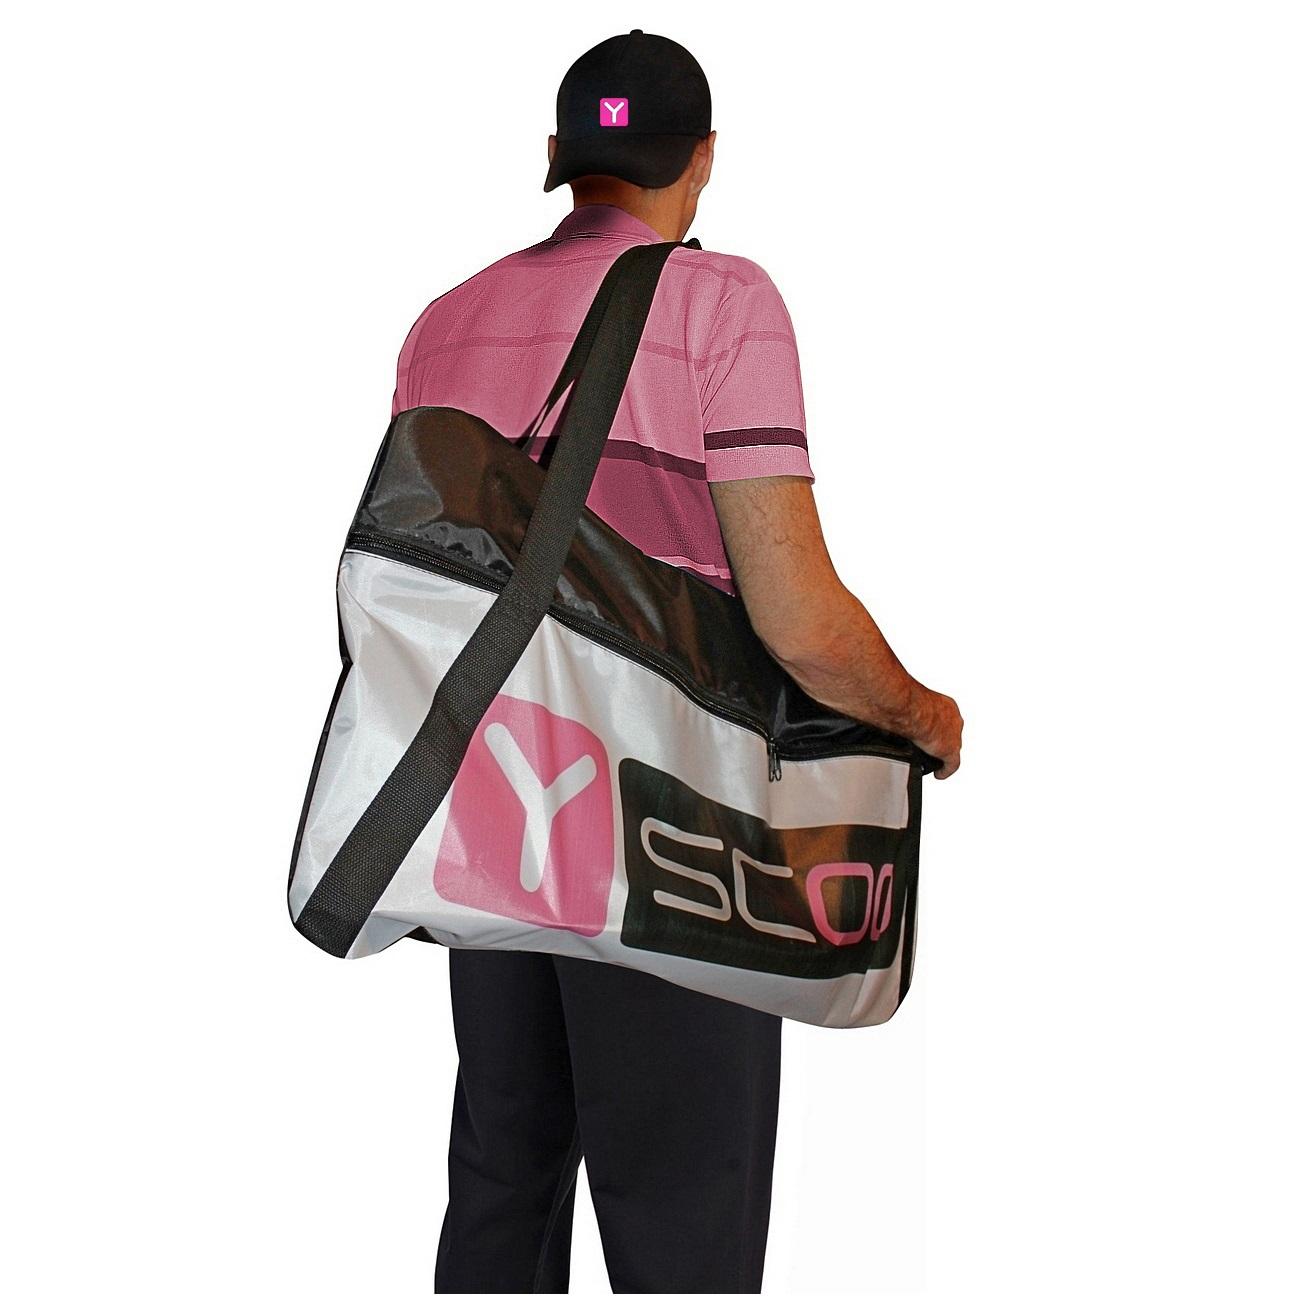 Сумка-чехол для Y-SCOO 125 Pink